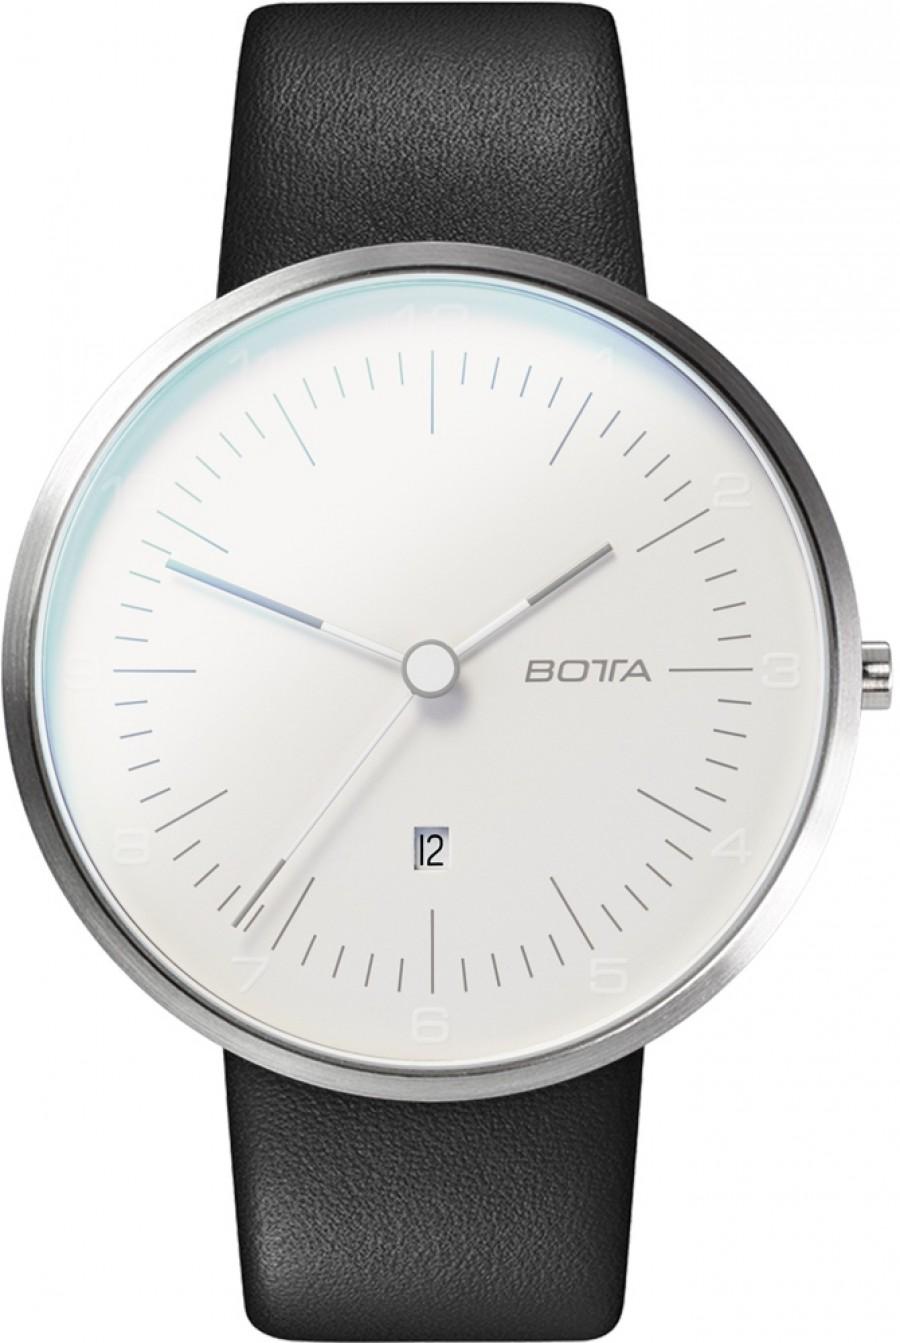 Botta Design tres plus pearl white 44mm